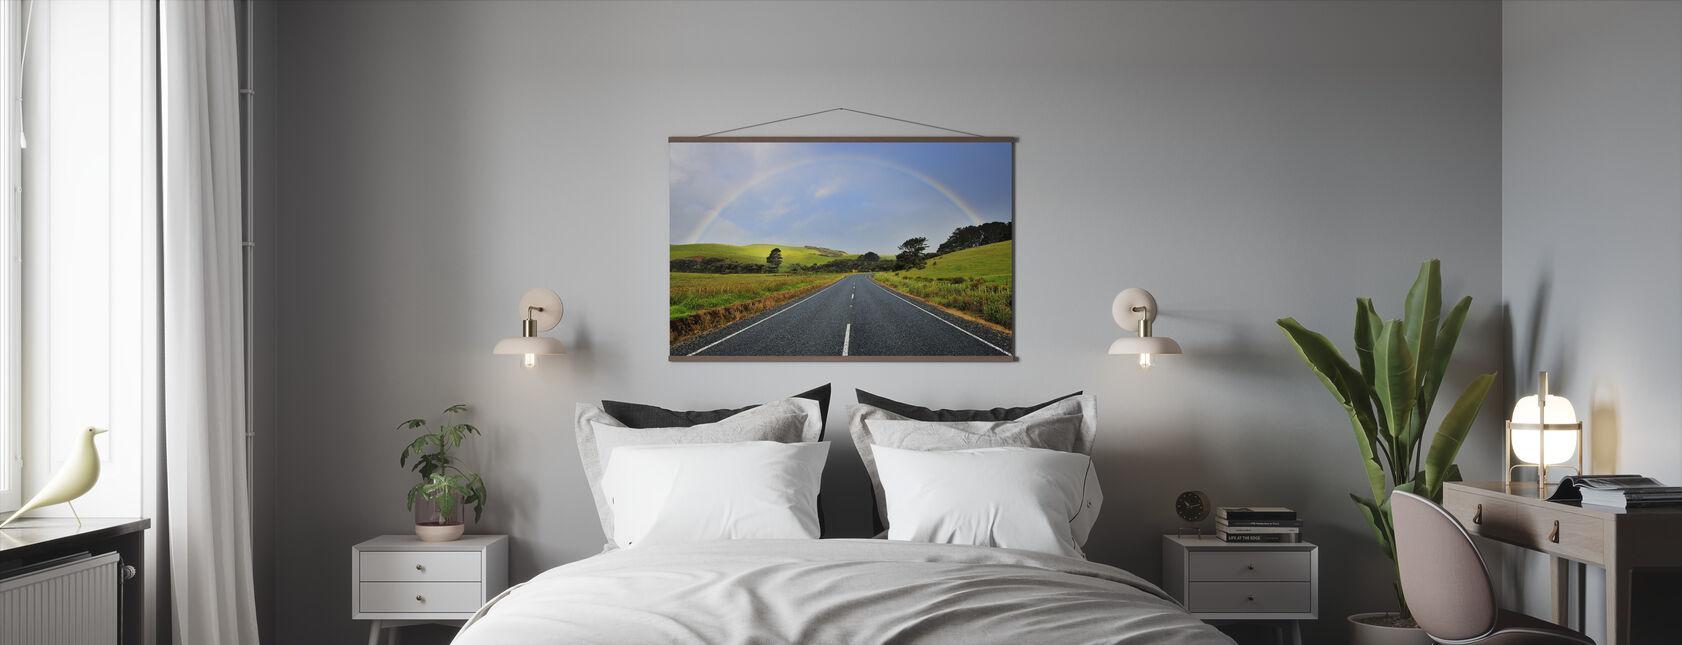 Rainbow Road - Poster - Bedroom